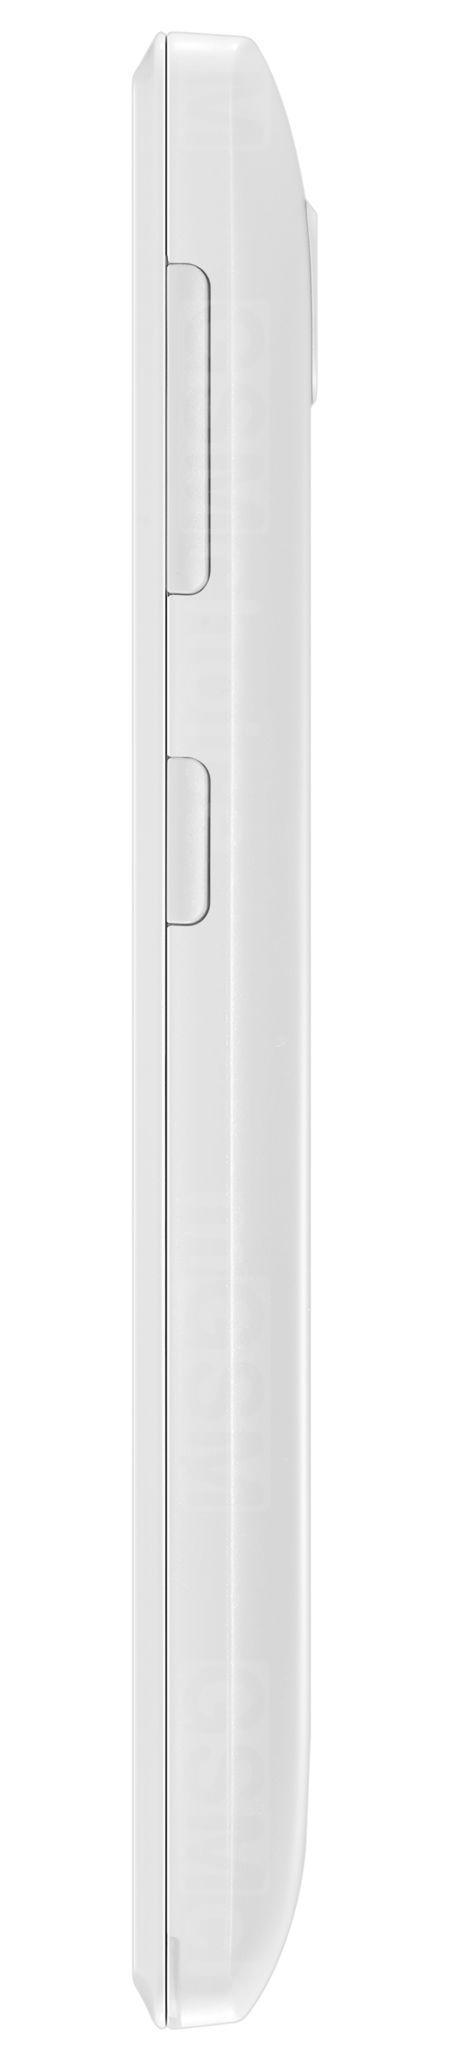 Lenovo A1000 Bildergalerie GSMchoice